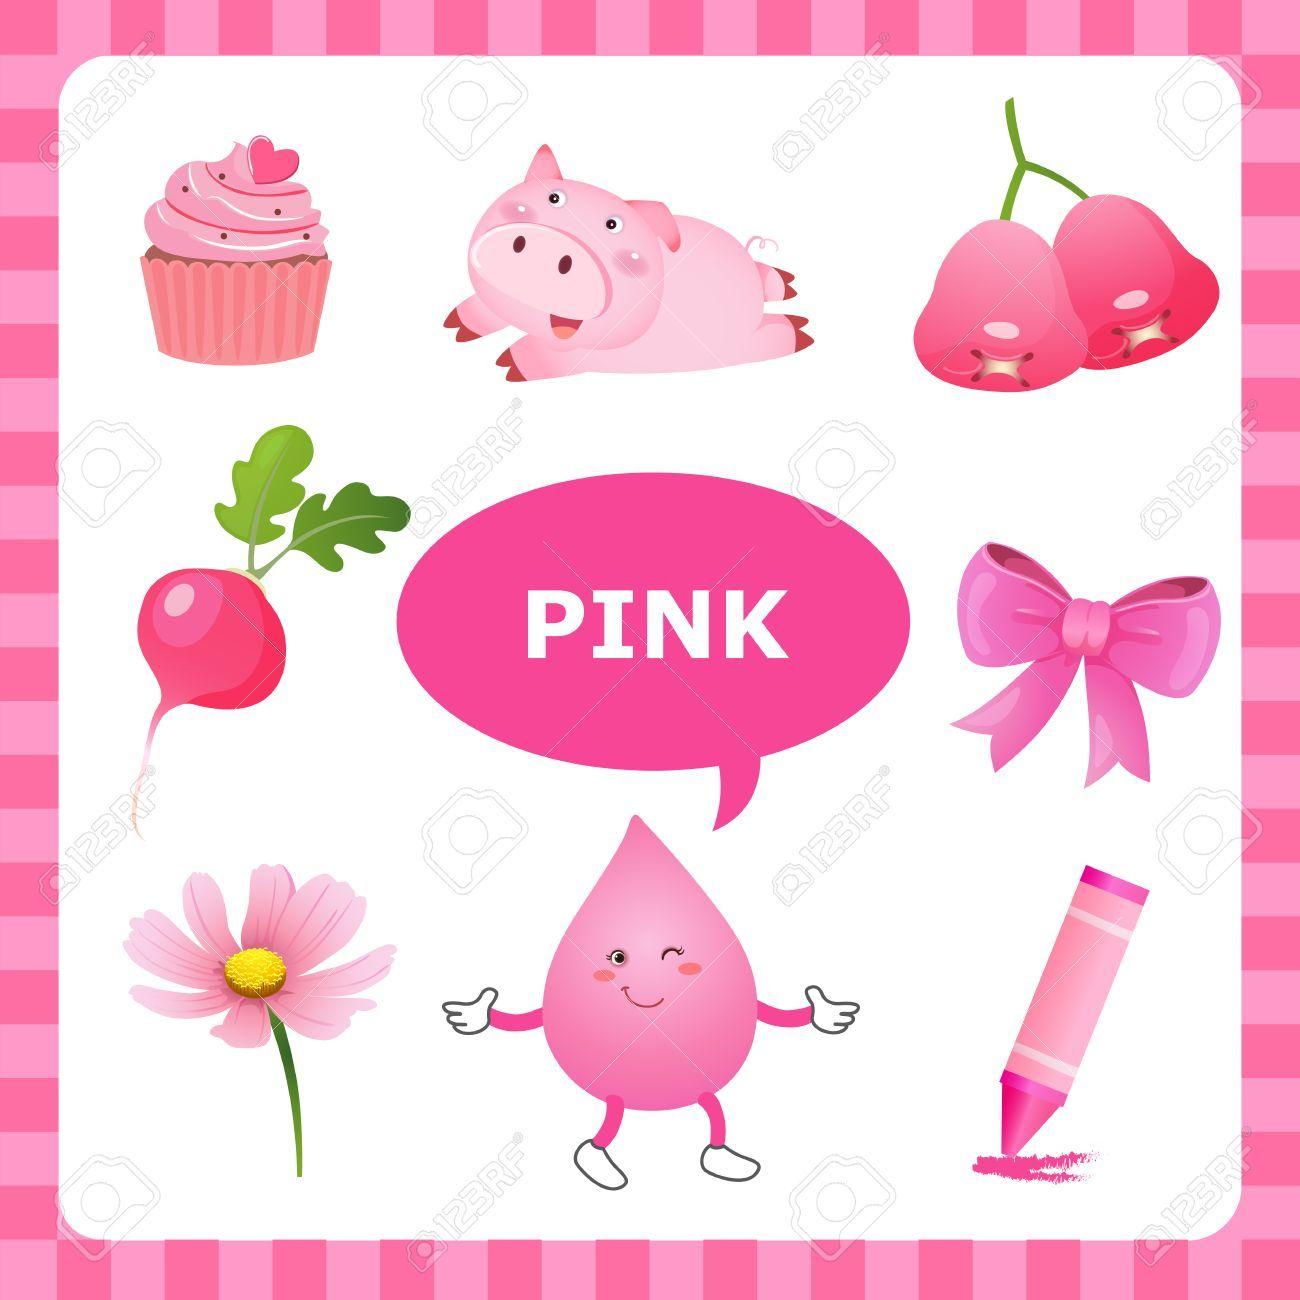 Pin By Vivi On Pink